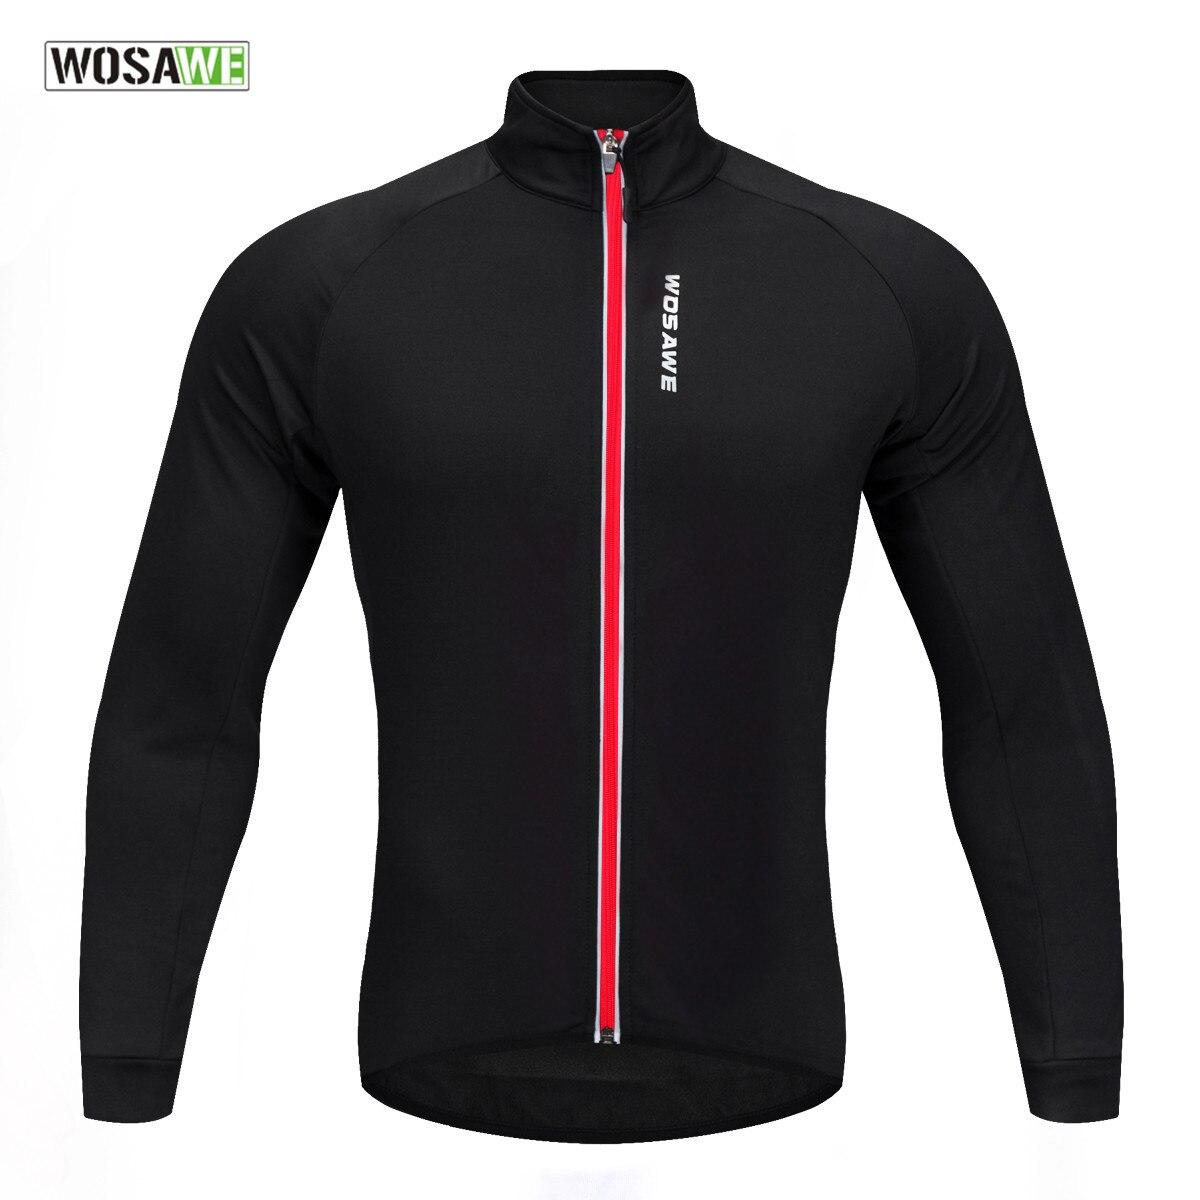 WOSAWE Soft Thermal Fleece Cycling Jersey Long Sleeve MTB Bike Bicycle Shirt Road Bike Autumn Winter Cycle Clothing цена